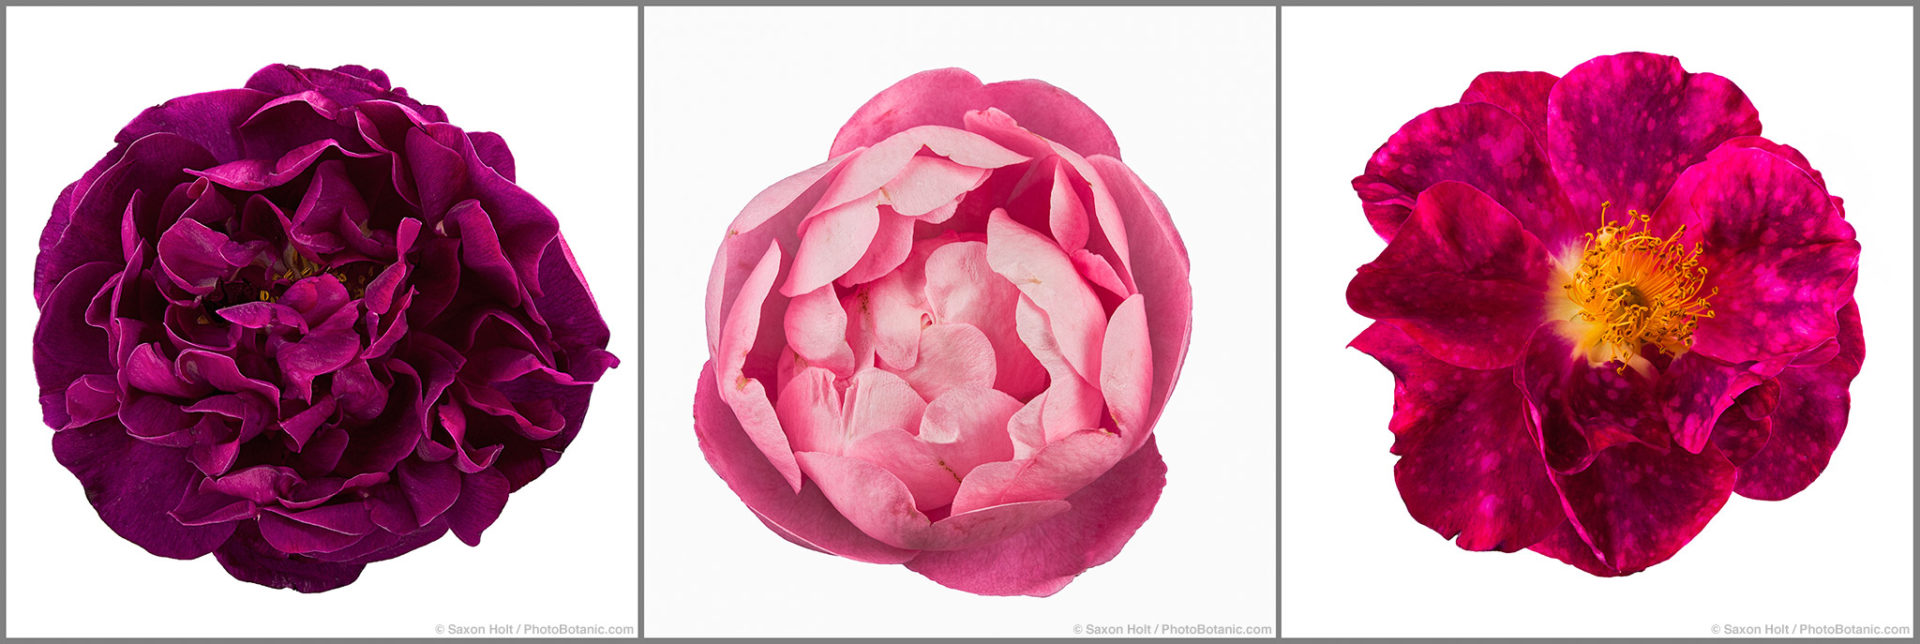 Old roses ( l to r) - 'Sissinghurst Castle', 'Raubritter', Rosa gallica 'Alain Blanchard'silhouette on white background